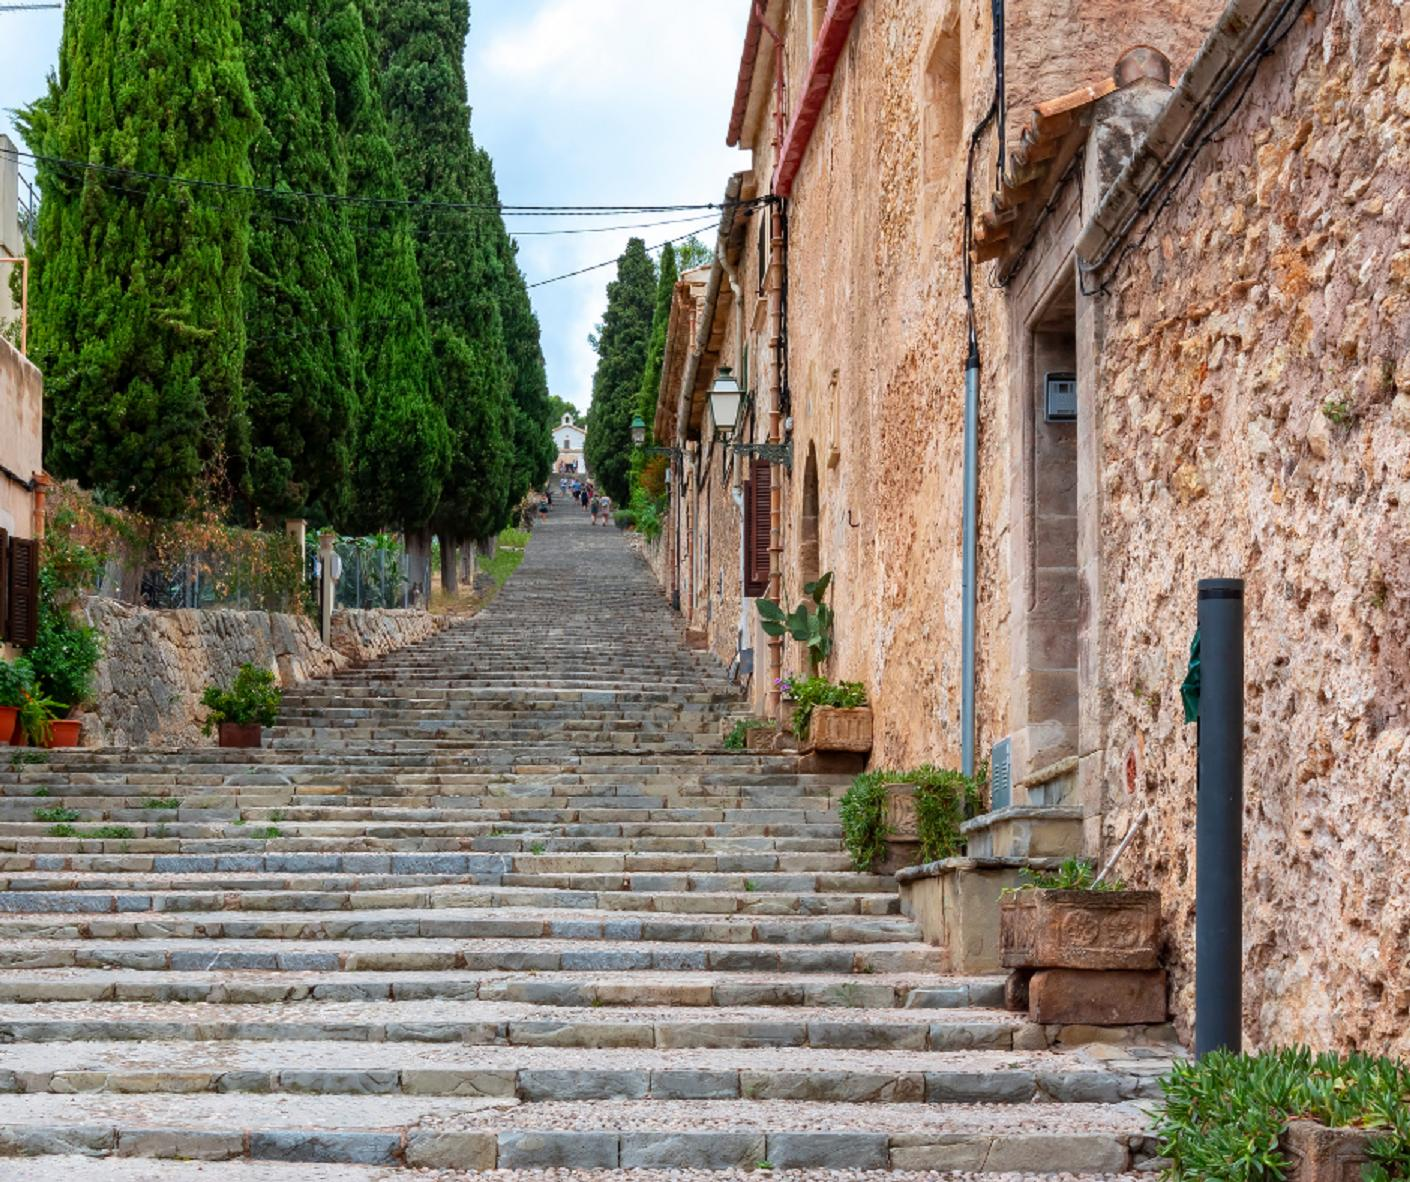 The Calvari steps.